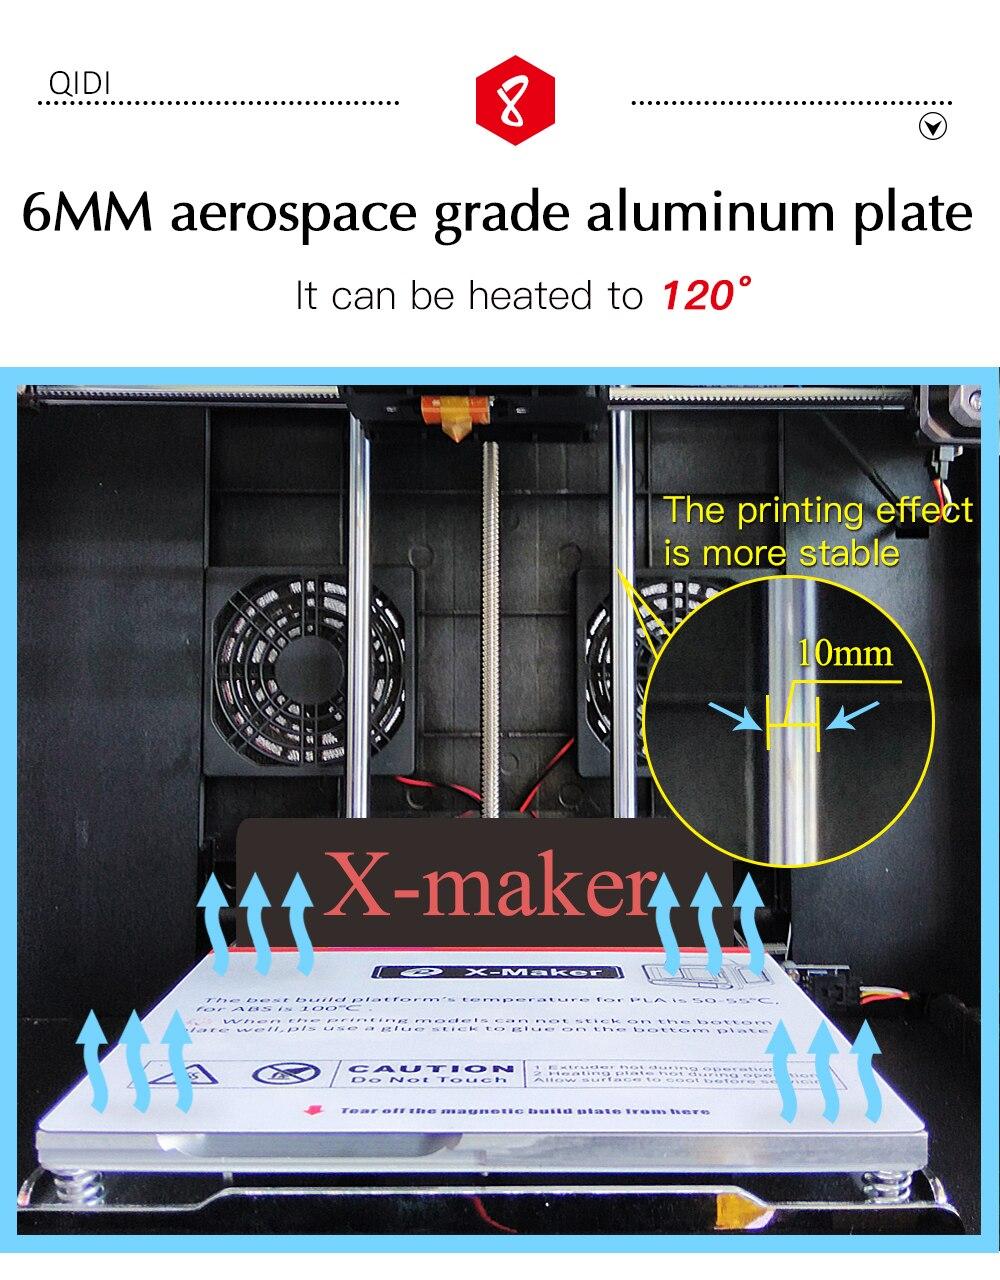 QIDI TECH X-Maker 3D Printer with Camera Wifi Touch Screen Single Nozzle Printing 16